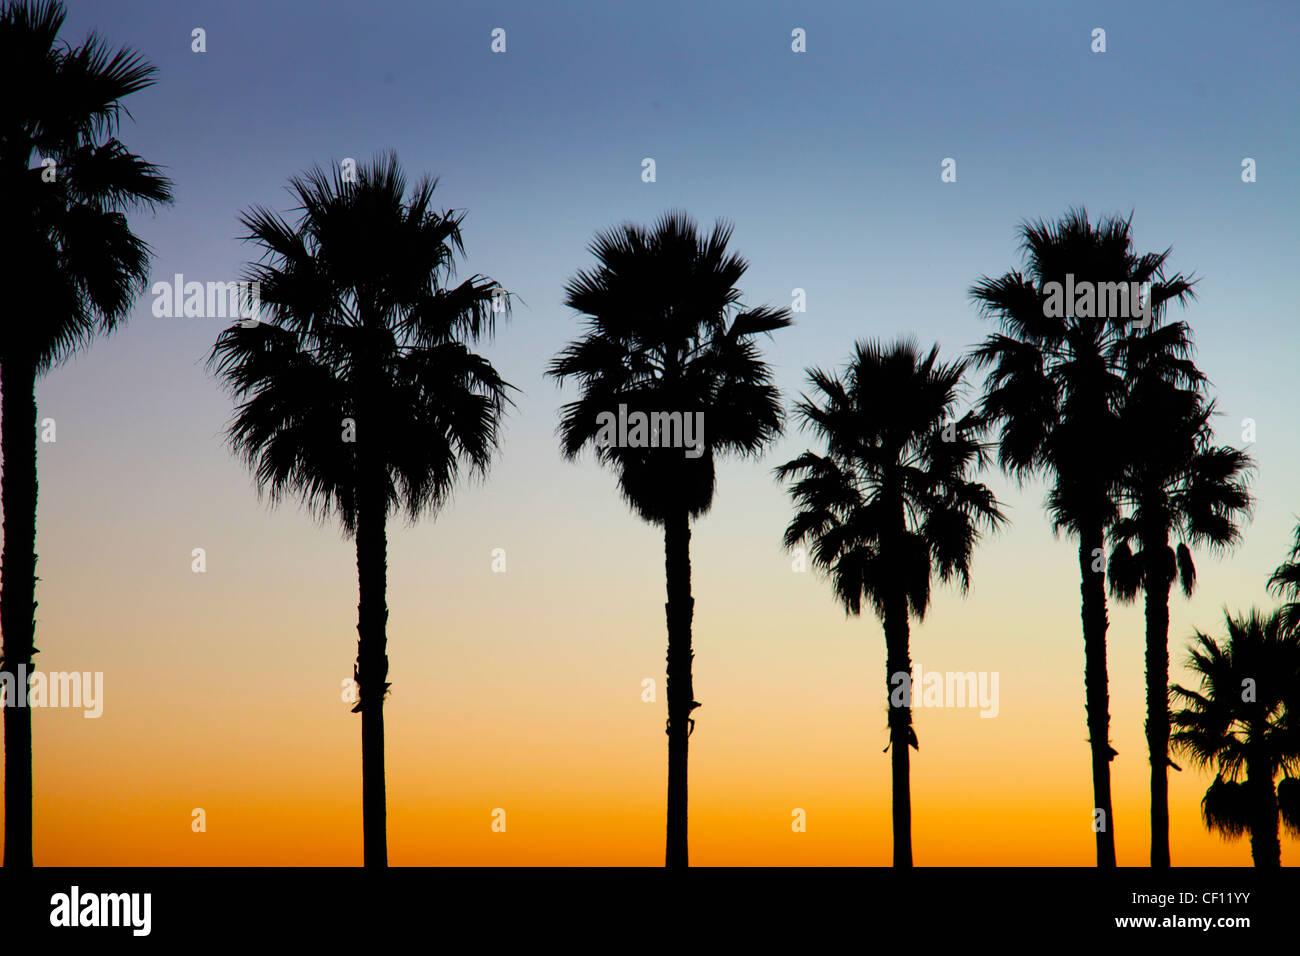 PALM TREES,CALIFORNIA,USA - Stock Image